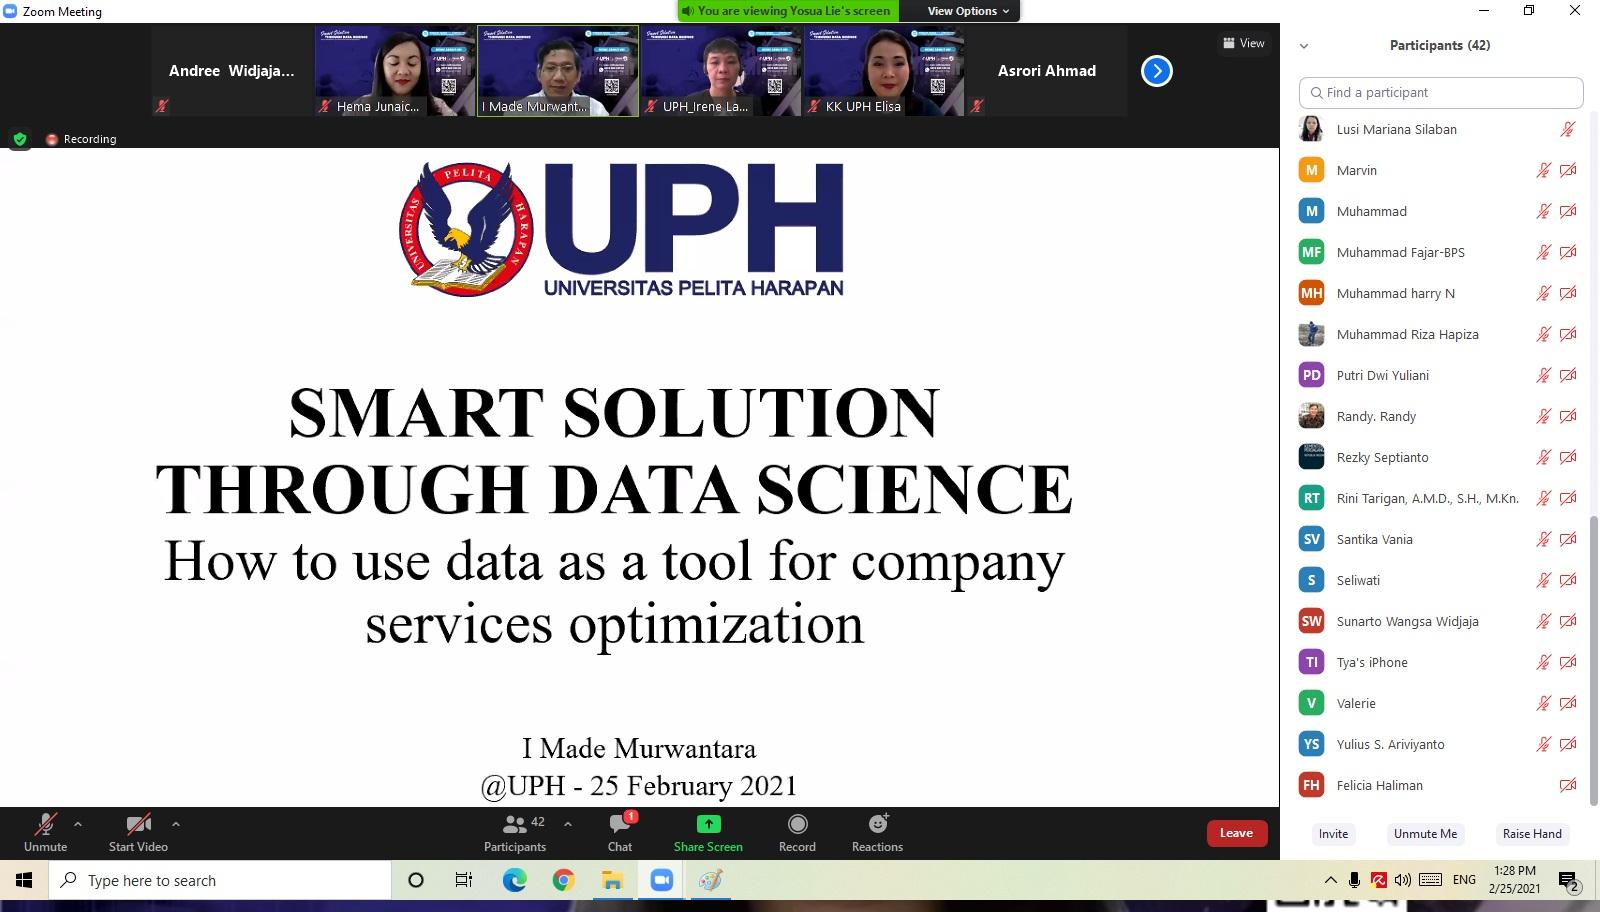 Webinar Smart Solution through Data Science